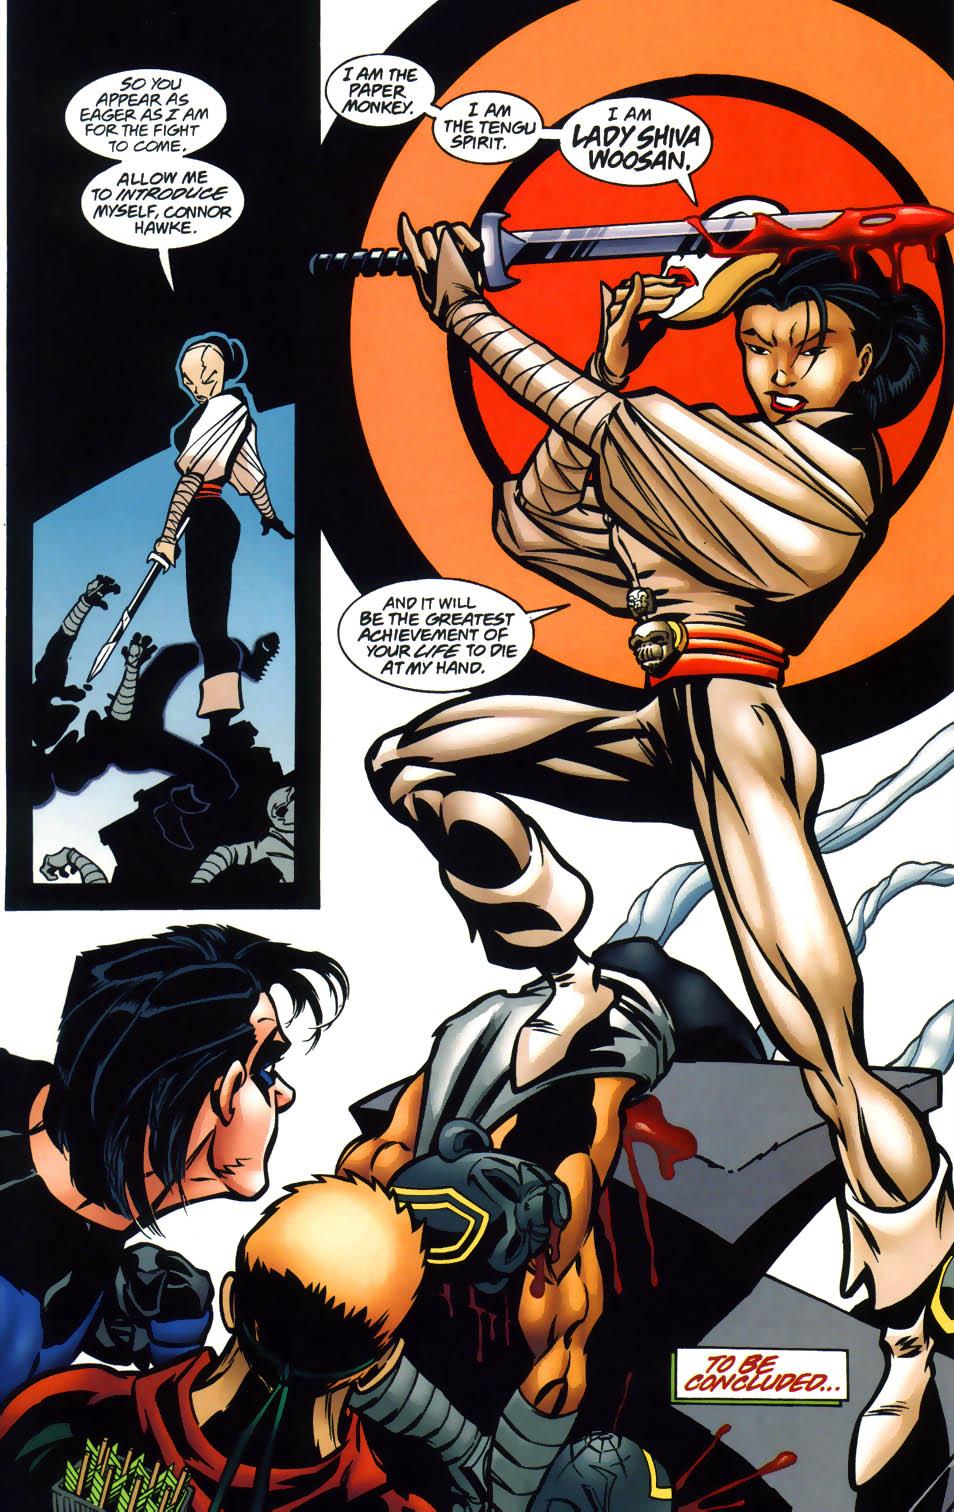 Nightwing 23 pg22 PaperMonkey LadyShiva.jpg